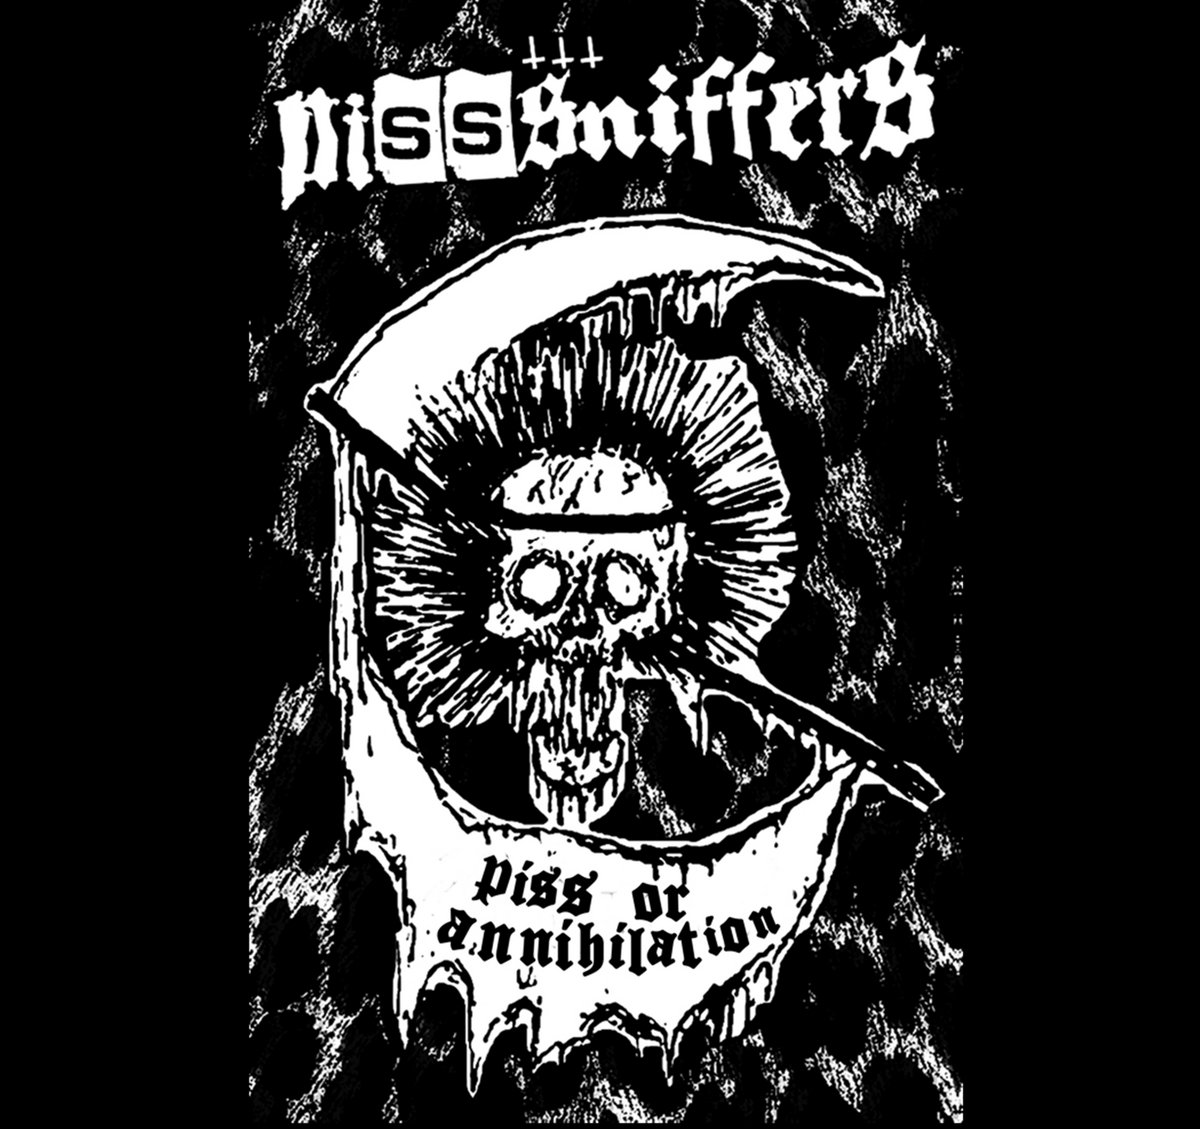 PissSniffers 'Piss or annihilation' CS